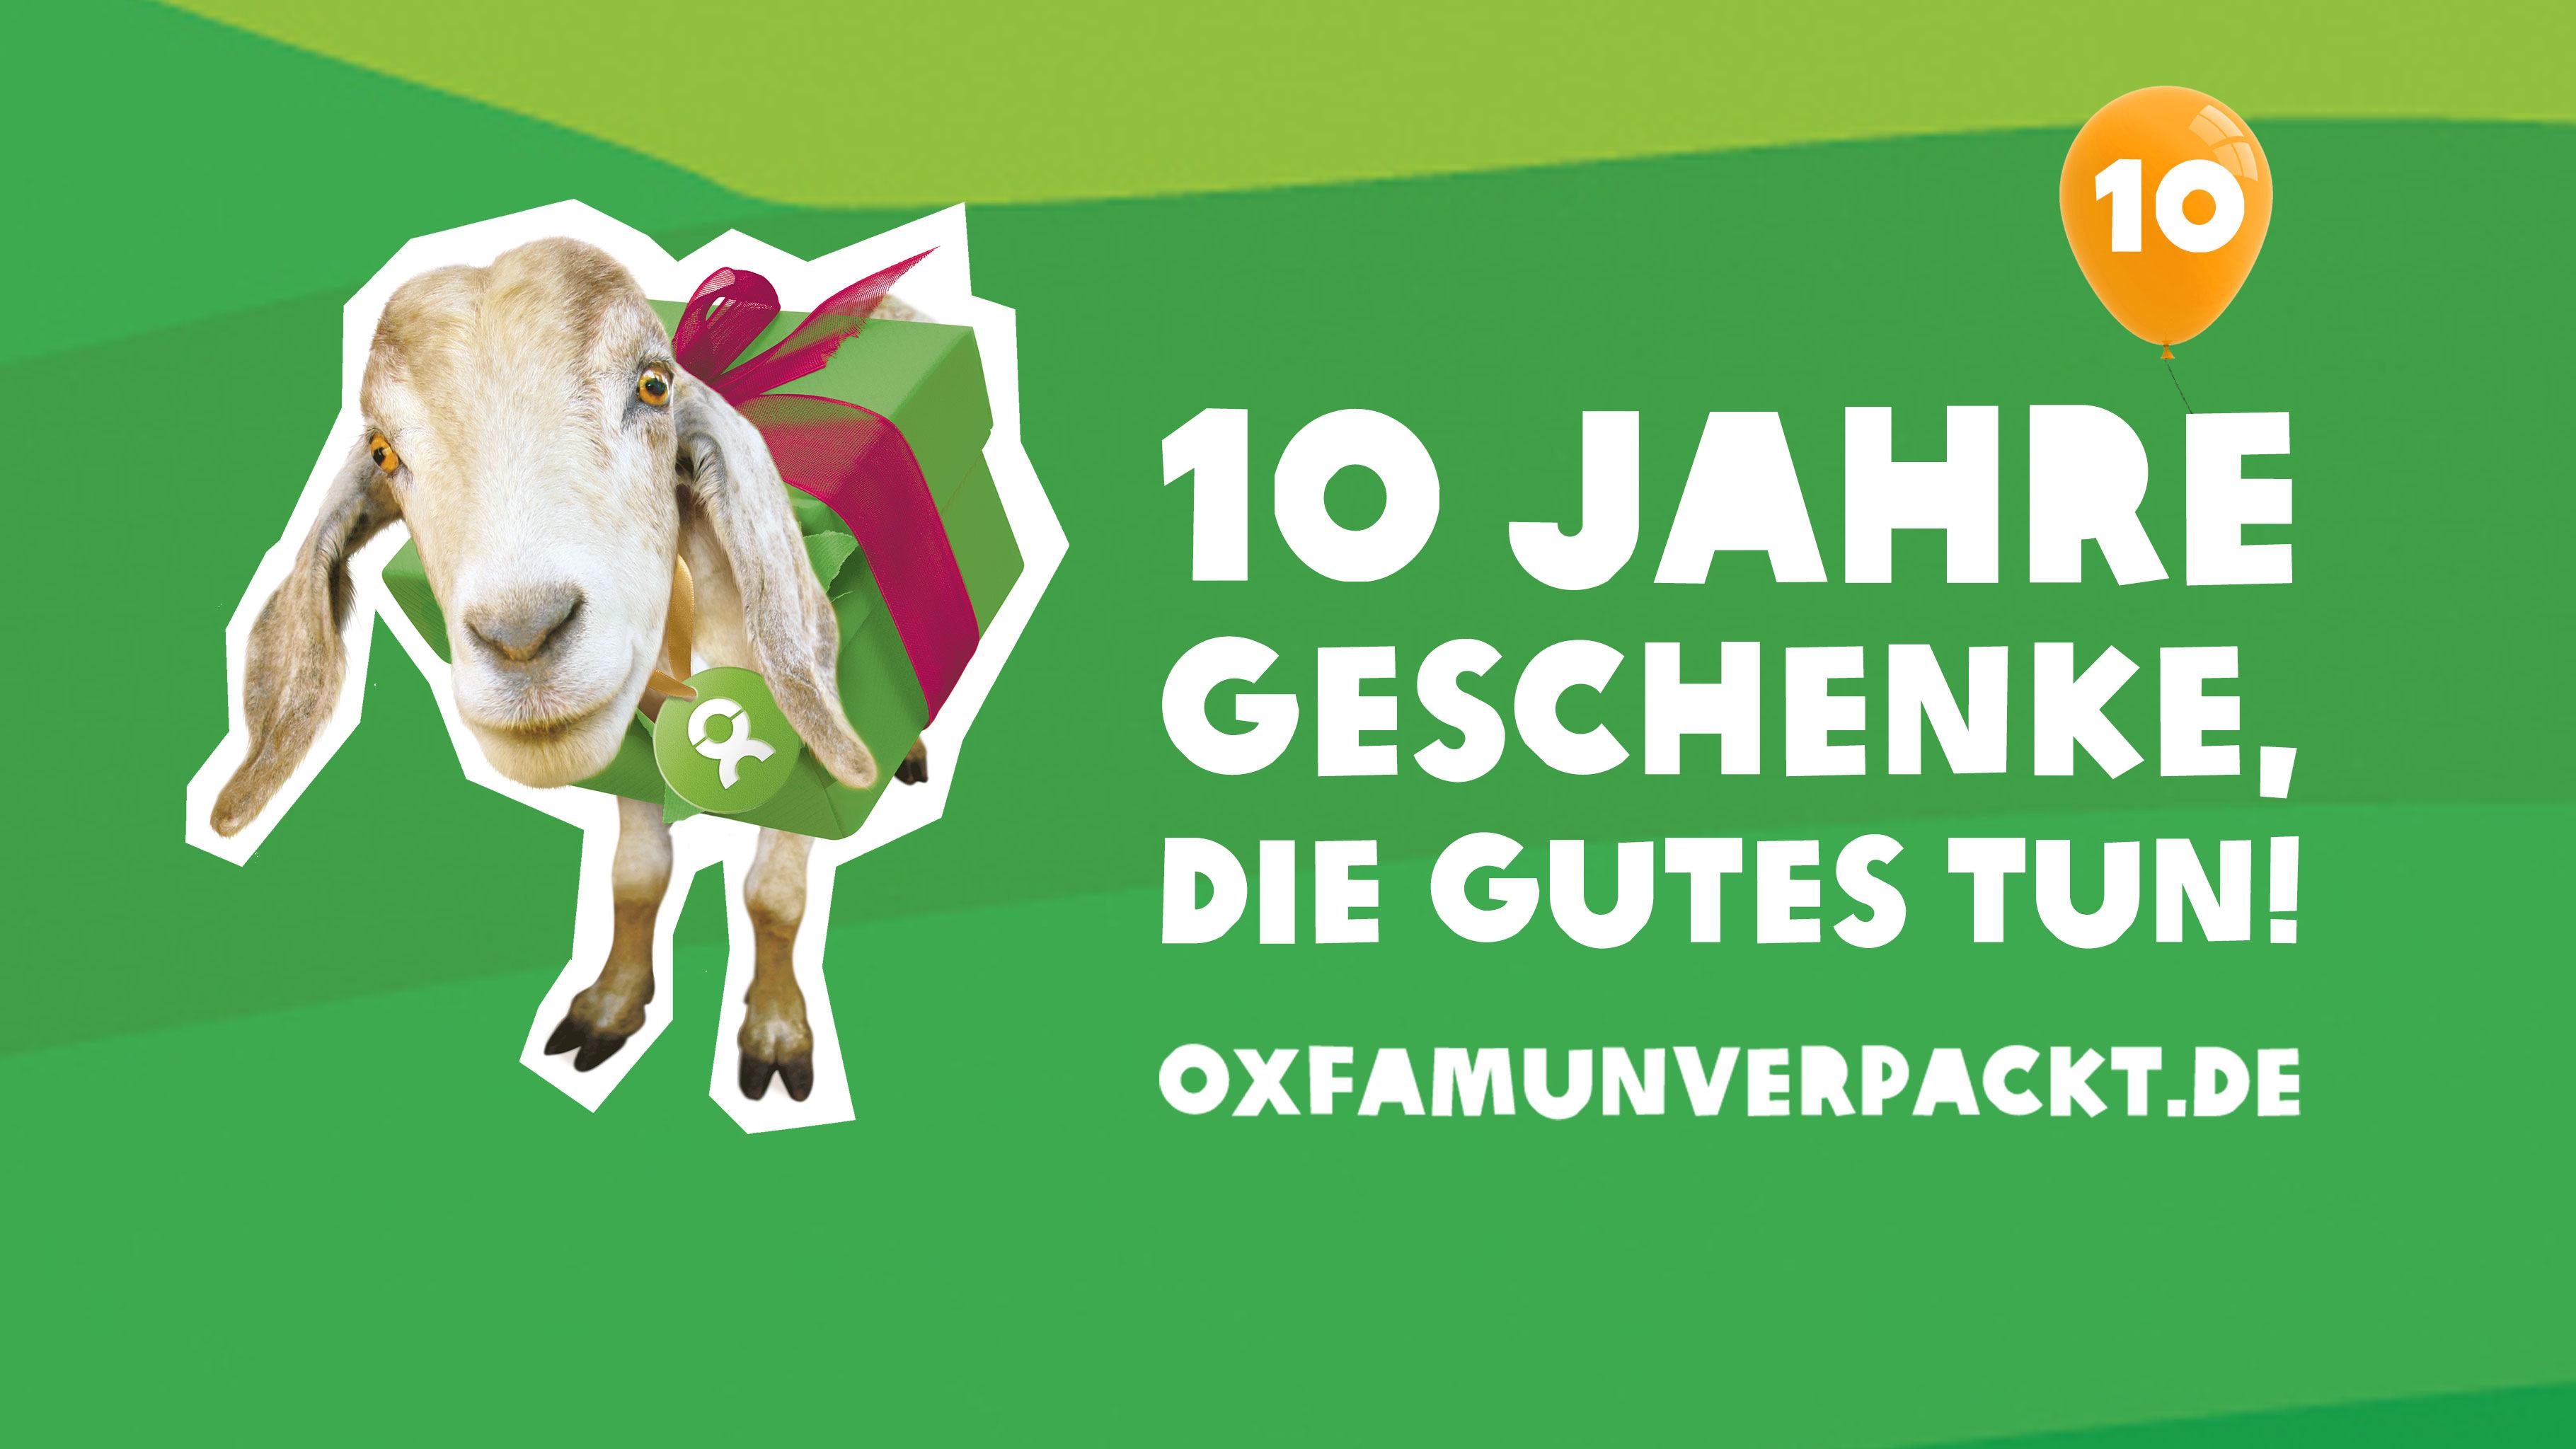 Zehn Jahre OxfamUnverpackt